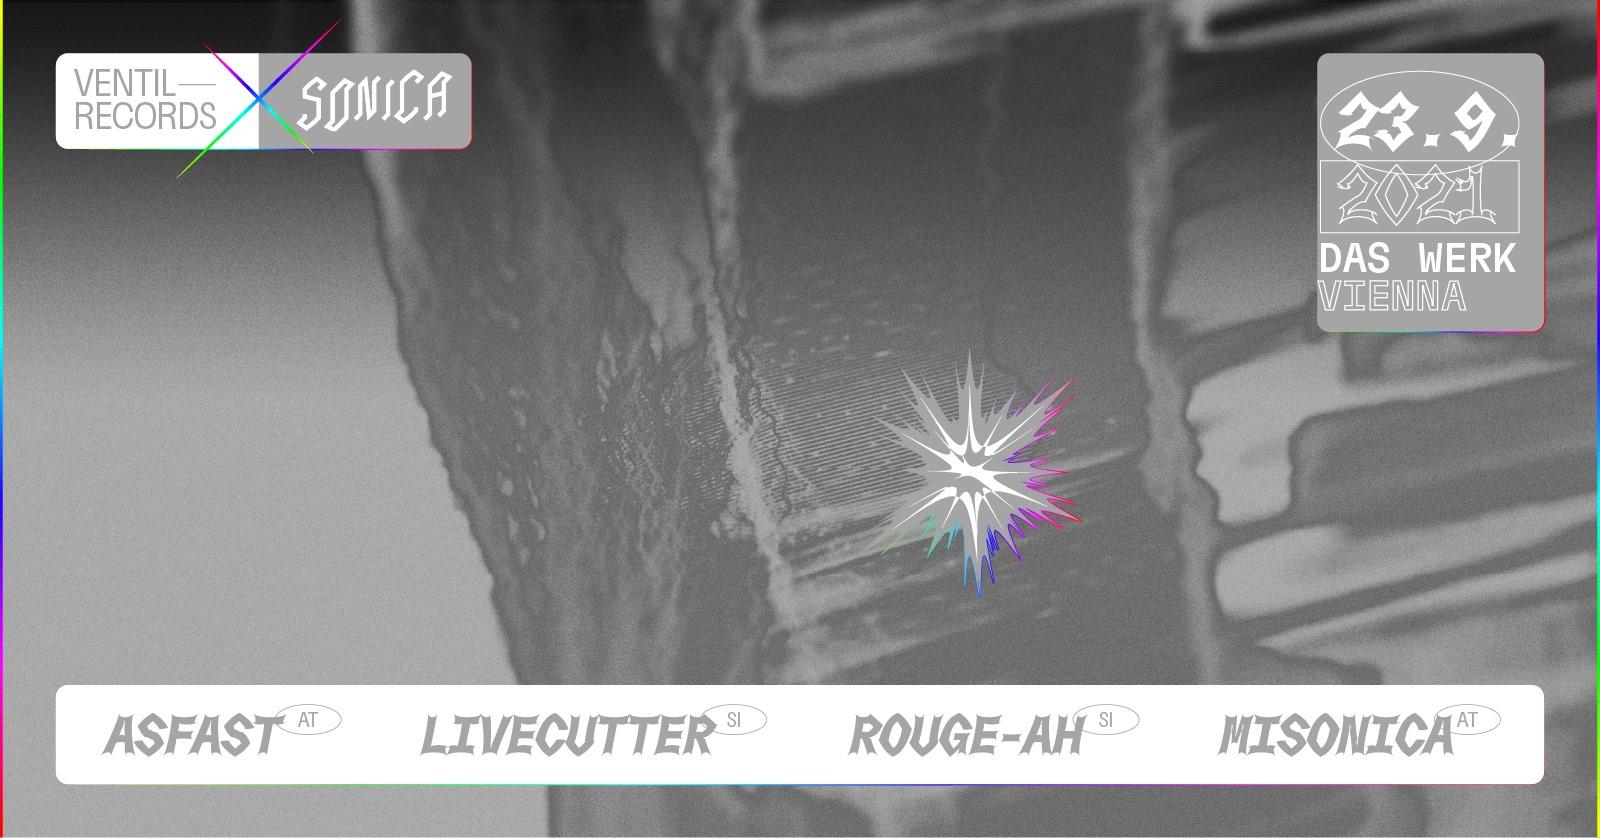 Events Wien: VENTIL RECORDS x SONICA FESTIVAL ::: Asfast / Lifecutter / Misonica / rouge-ah ::: more tba